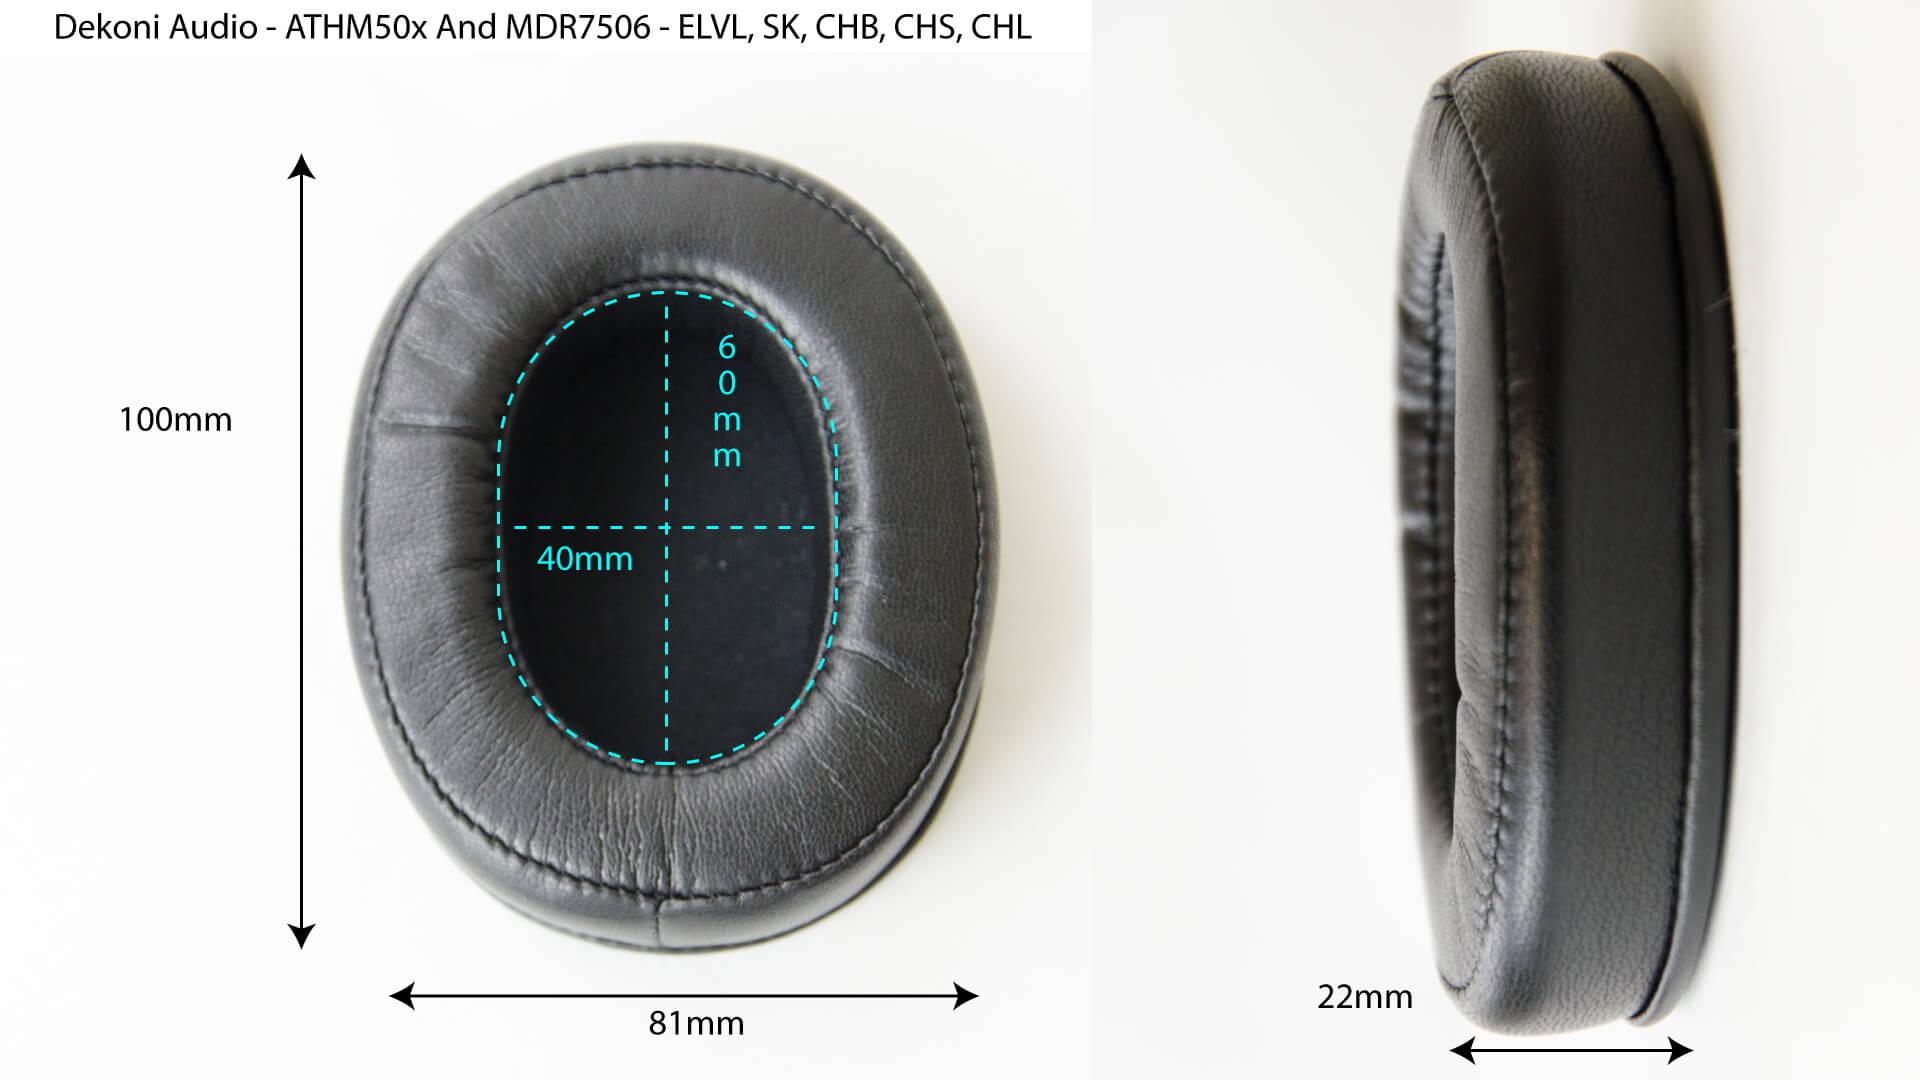 ATHM50x Dimensions